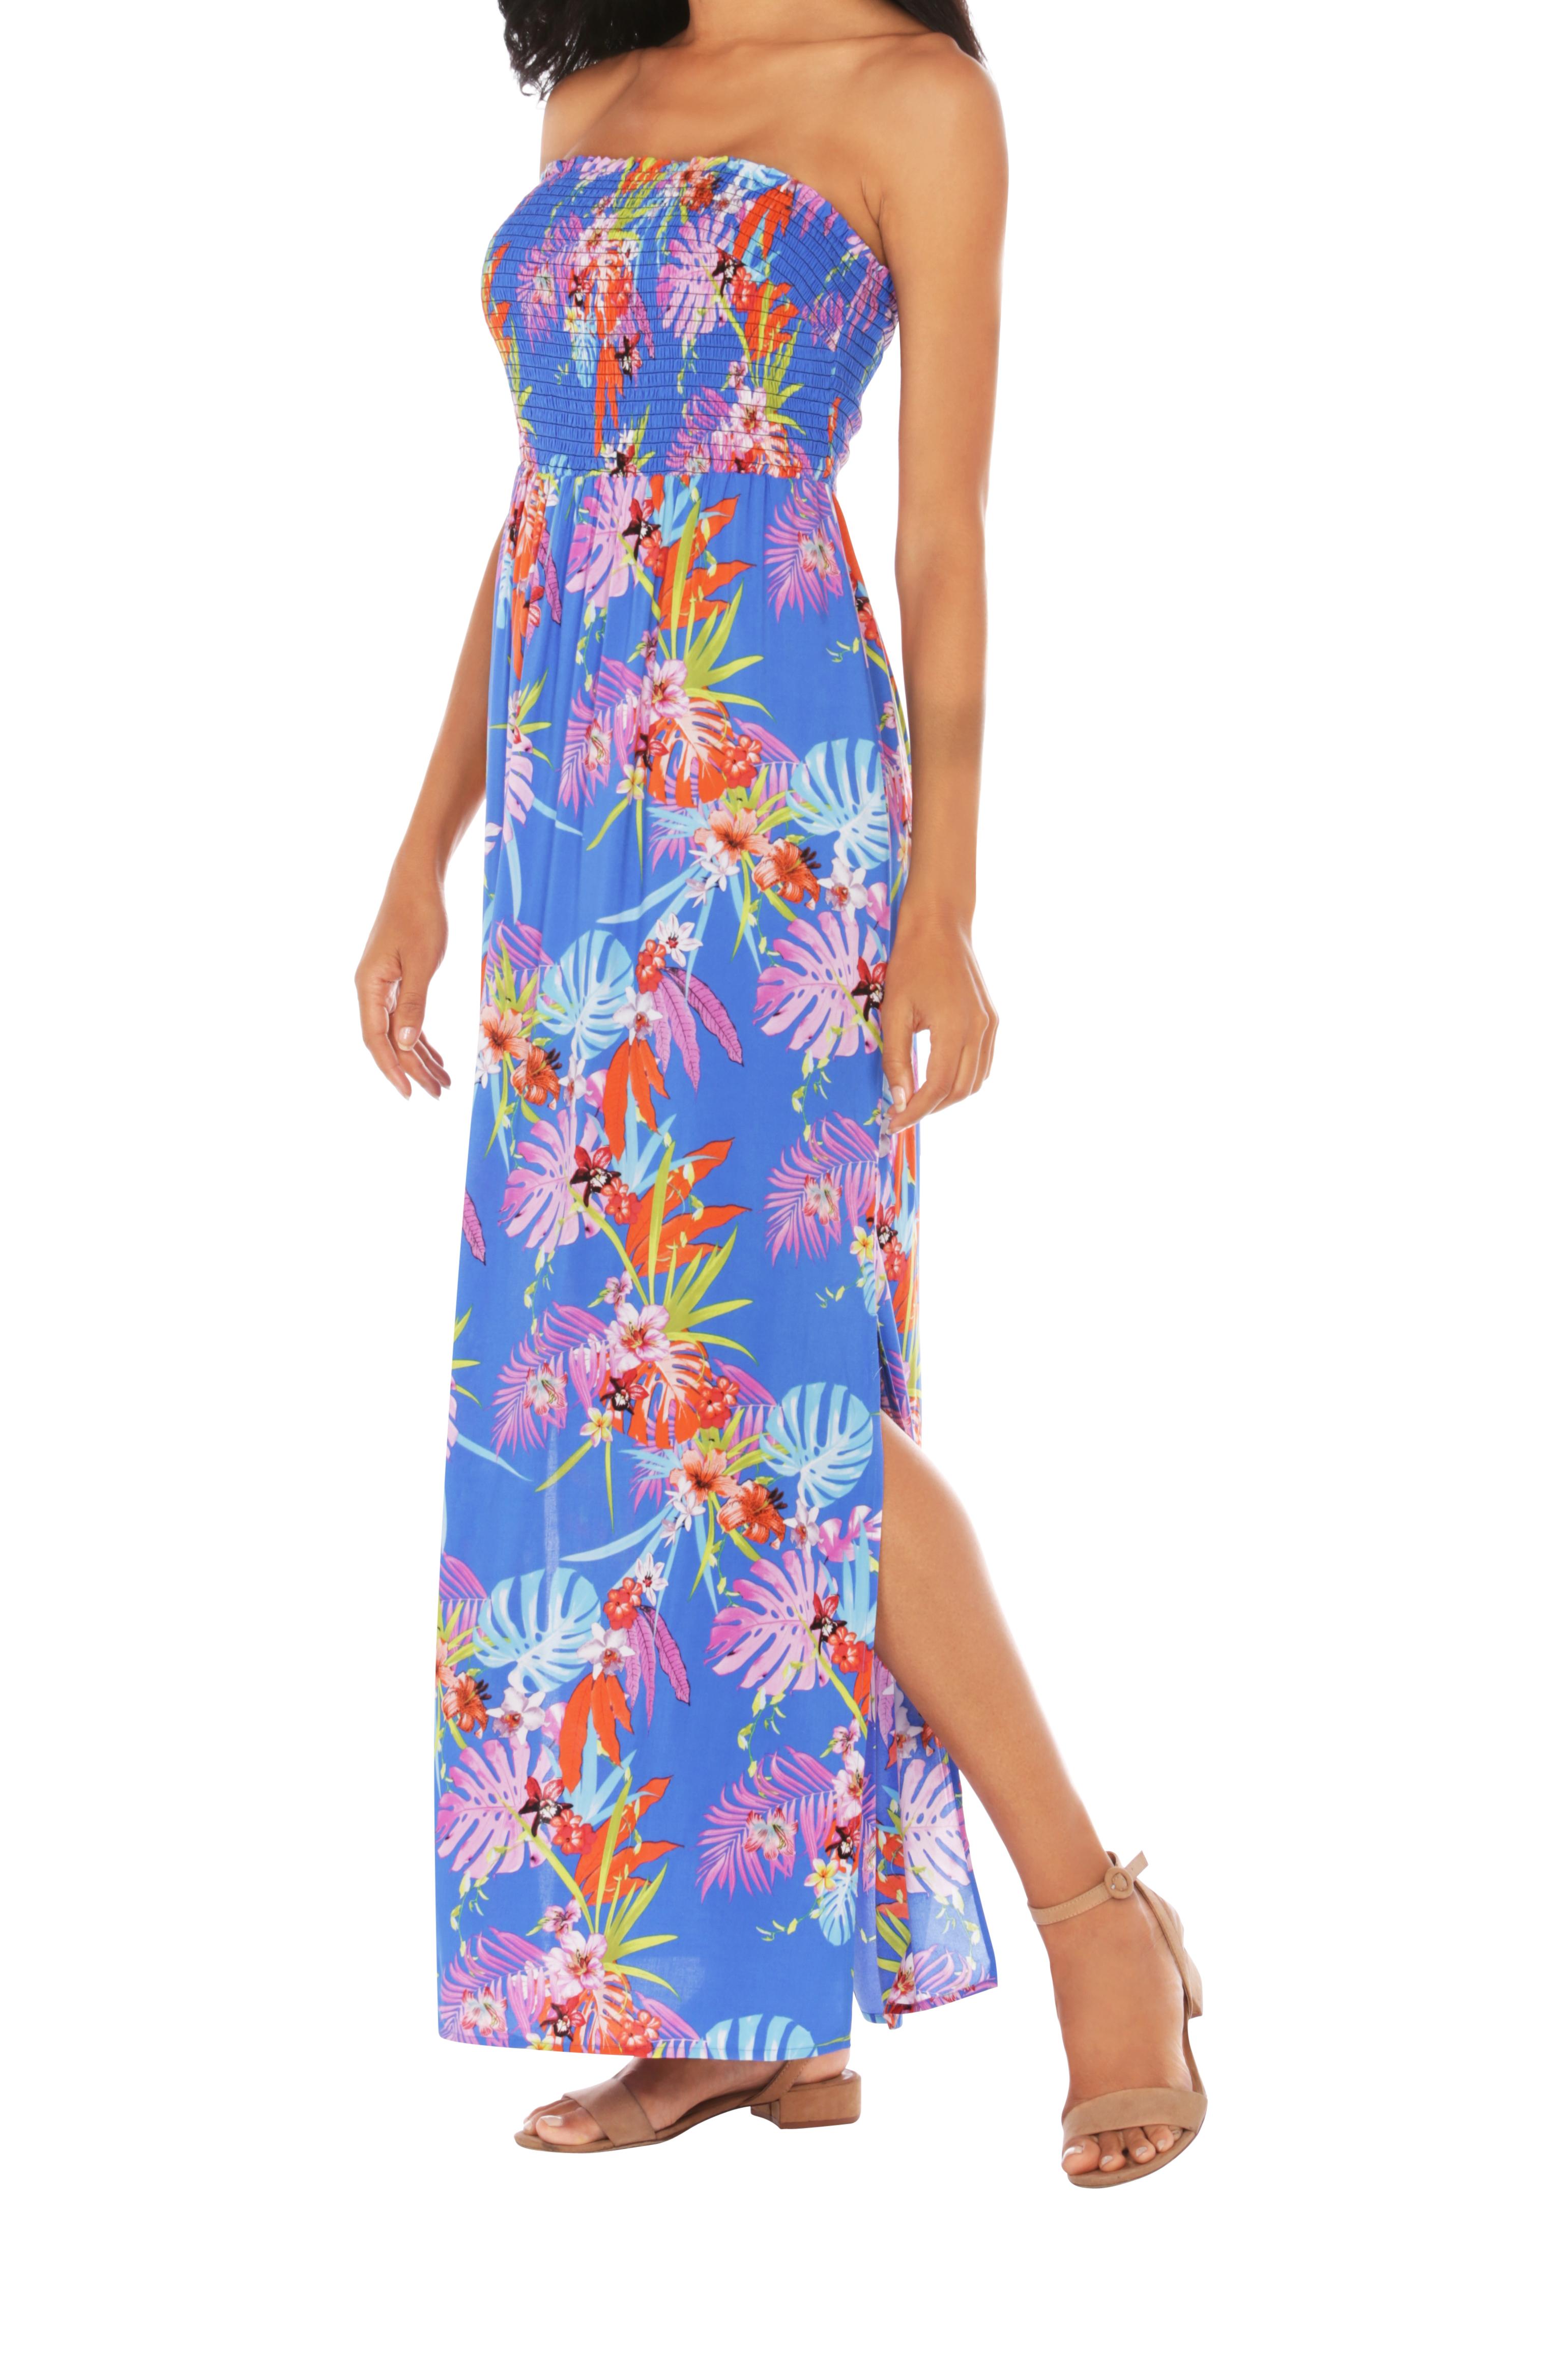 Caribbean Joe® Smocked Maxi Dress - Blue Jewel - Front